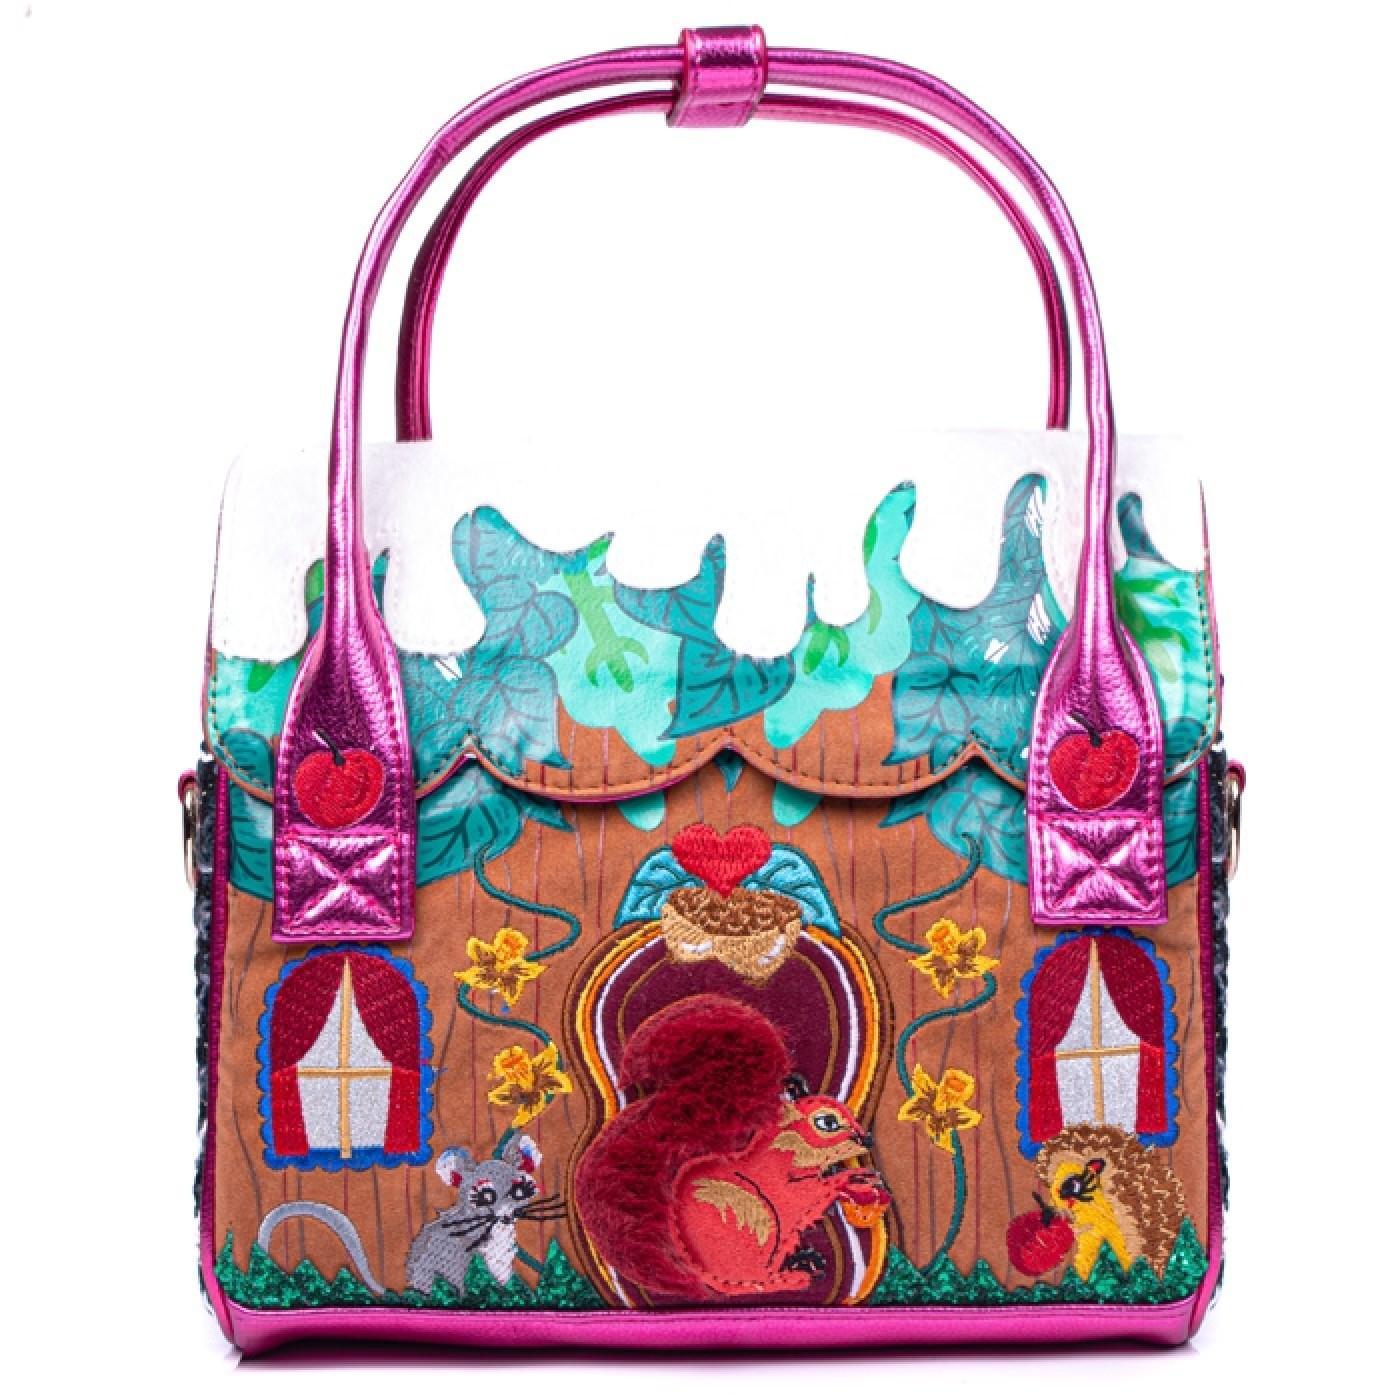 McNutty's Cabin IRREGULAR CHOICE Squirrel Handbag